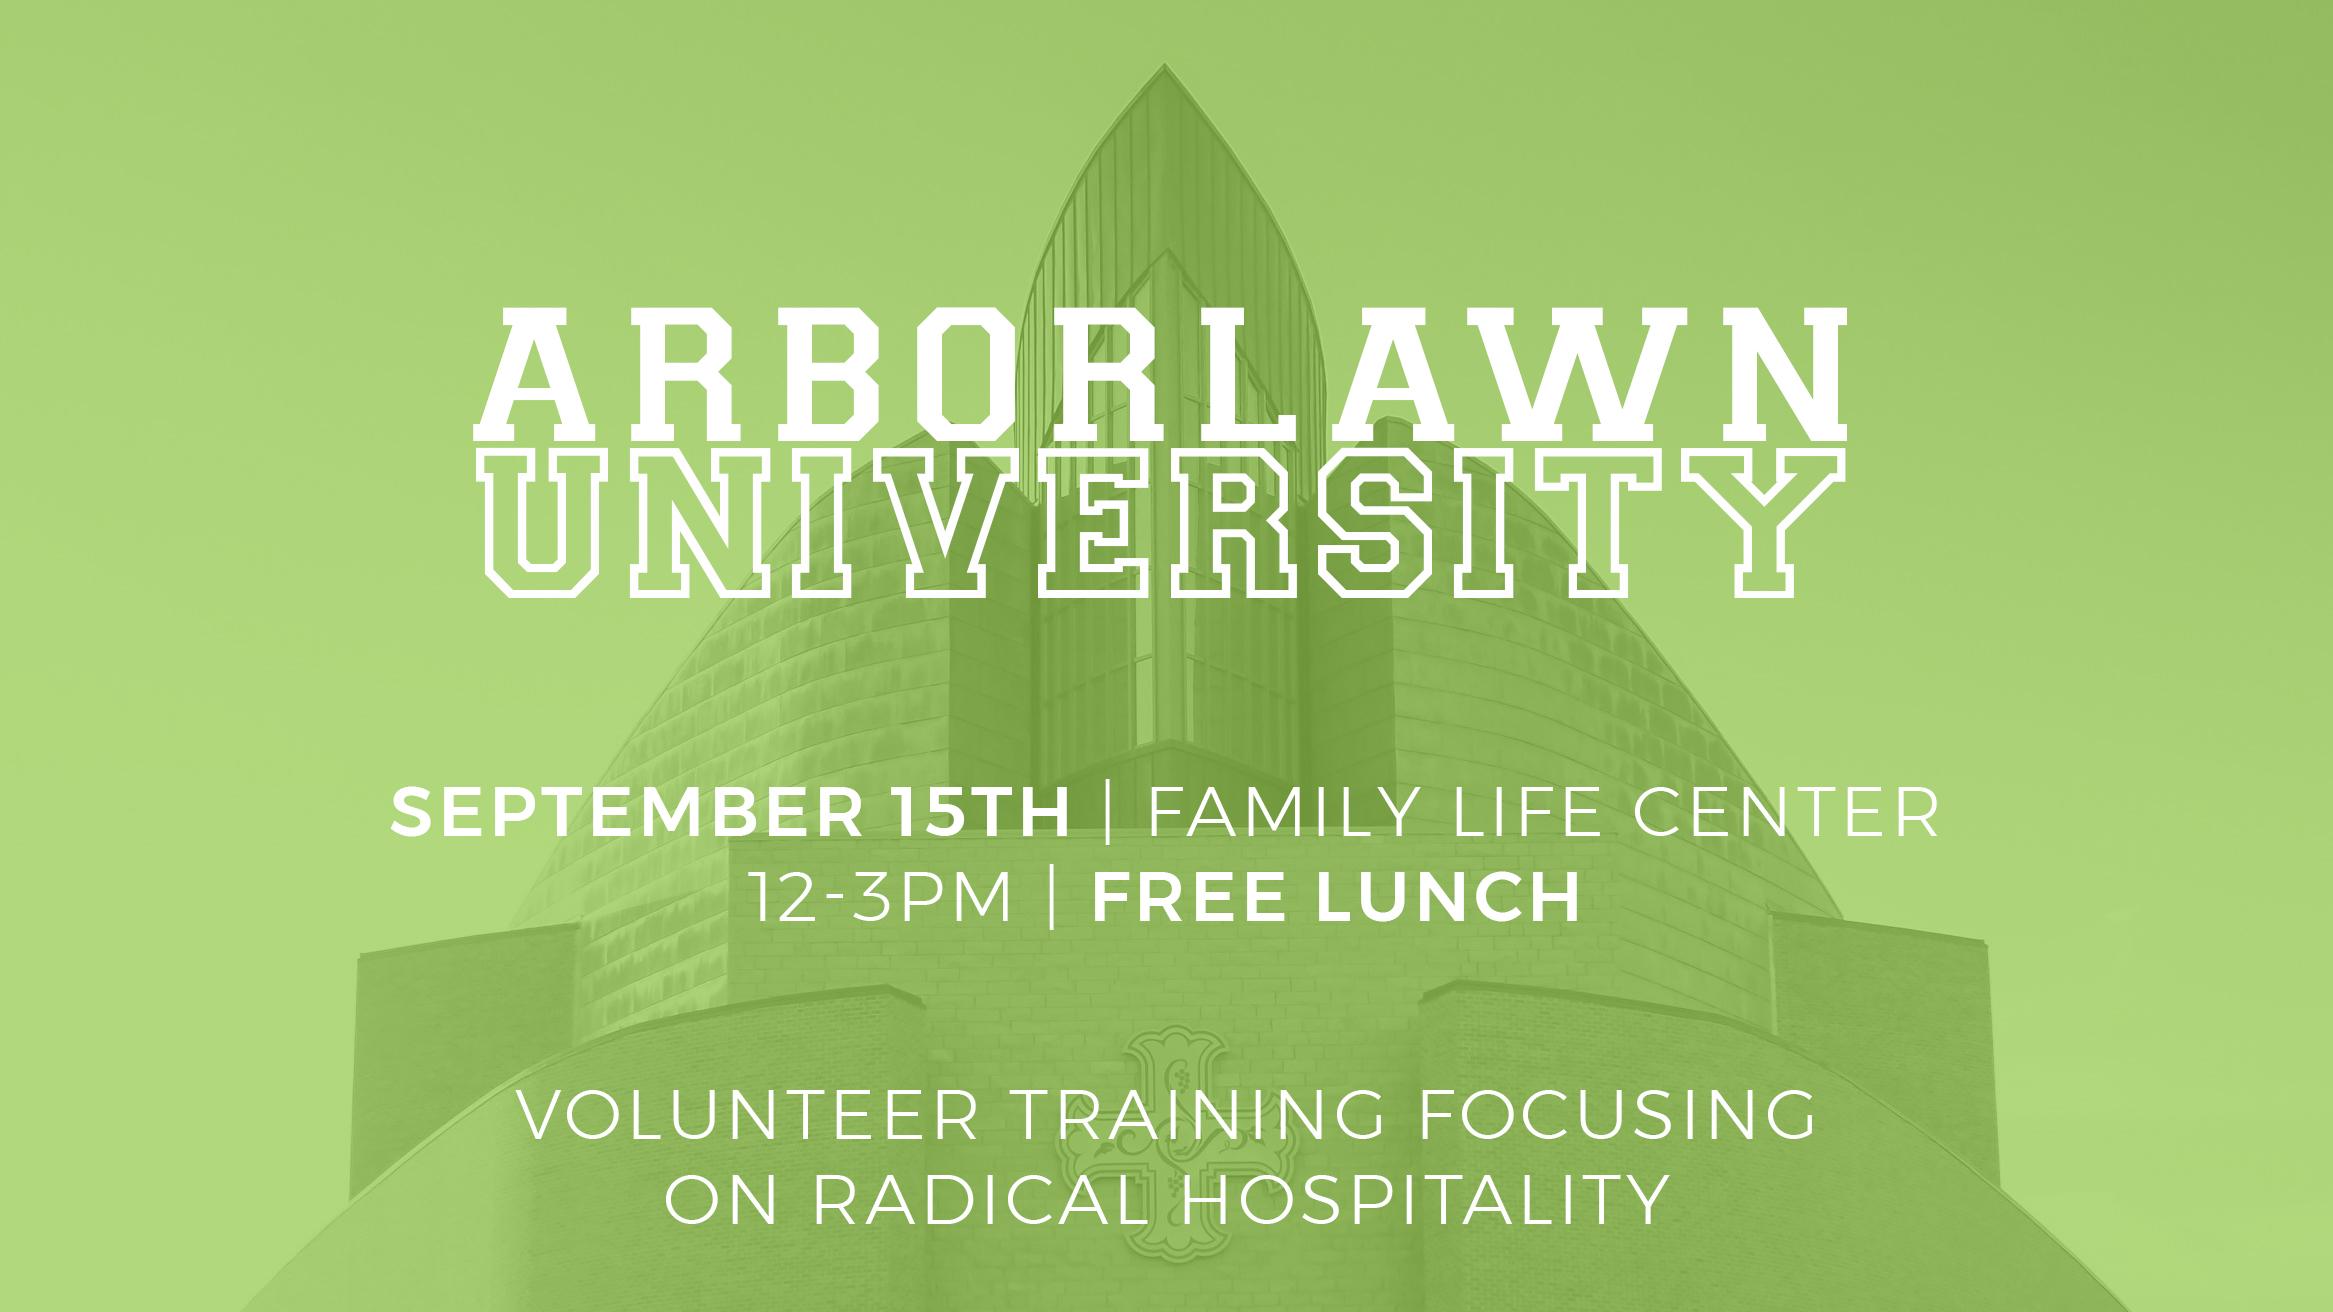 ArborlawnUniversity.jpg